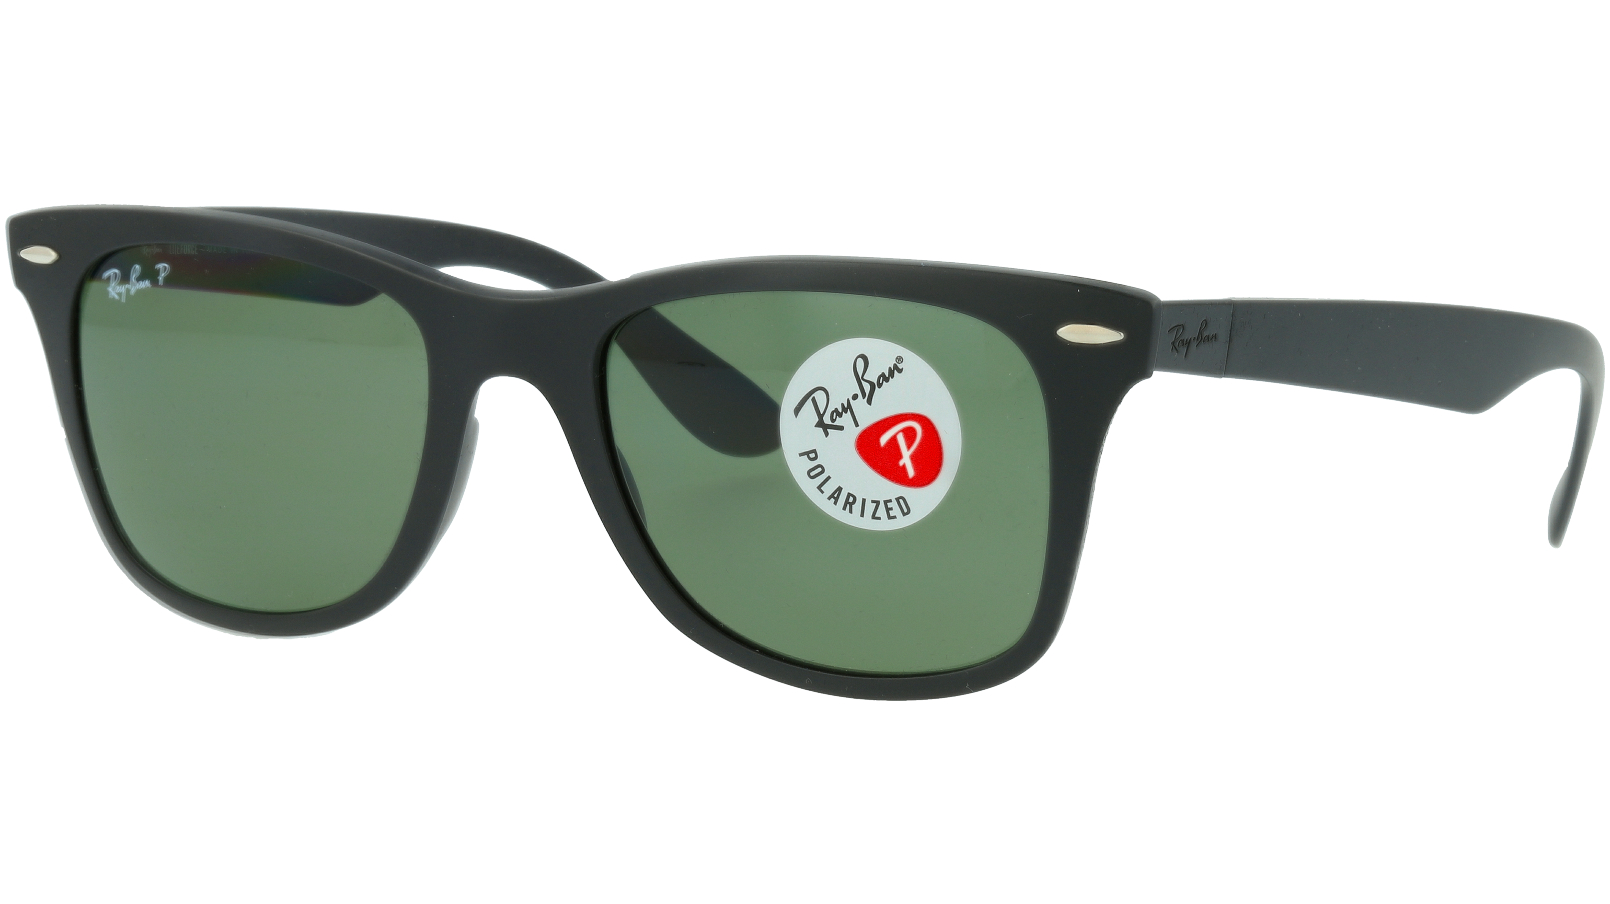 Ray-Ban RB4195 601S9A 52 MATT Polarised Sunglasses